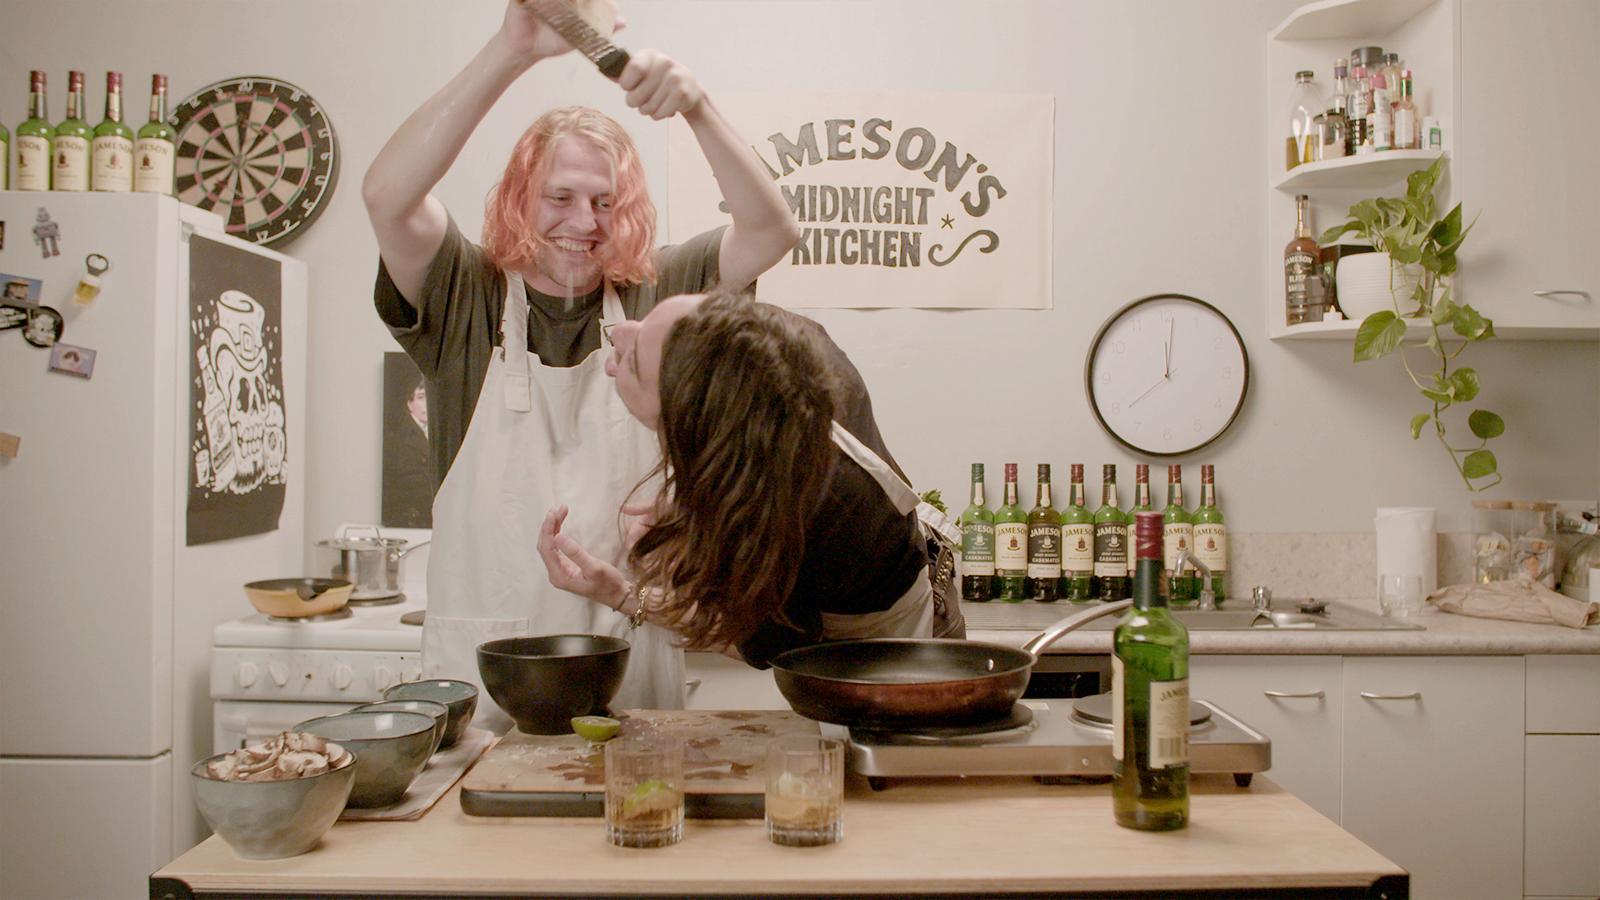 jamesons_midnight_kitchen_01